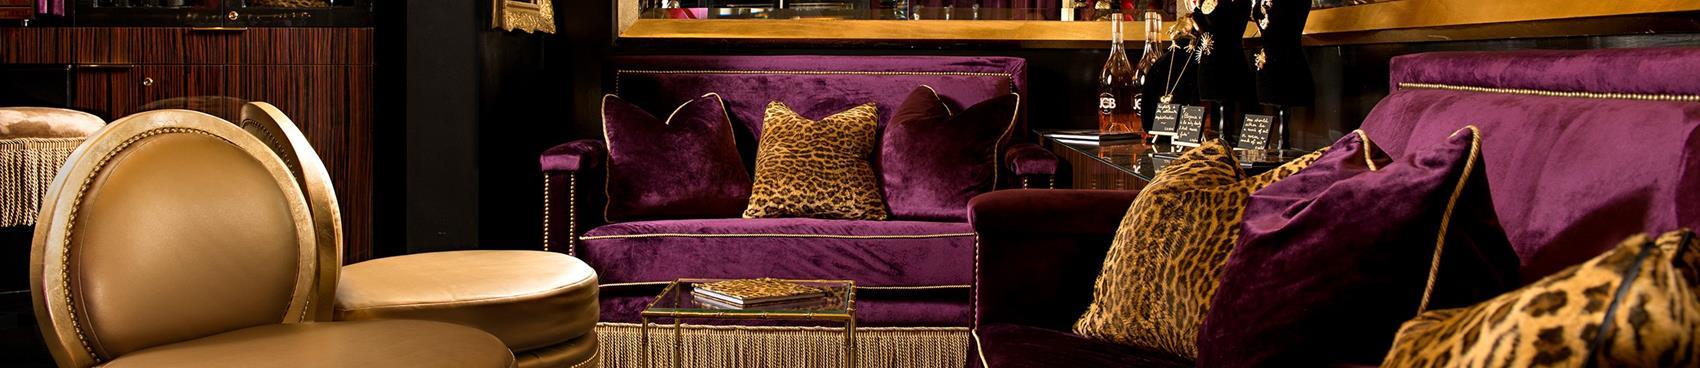 JCB Tasting Lounge at Ritz-Carlton San Francisco